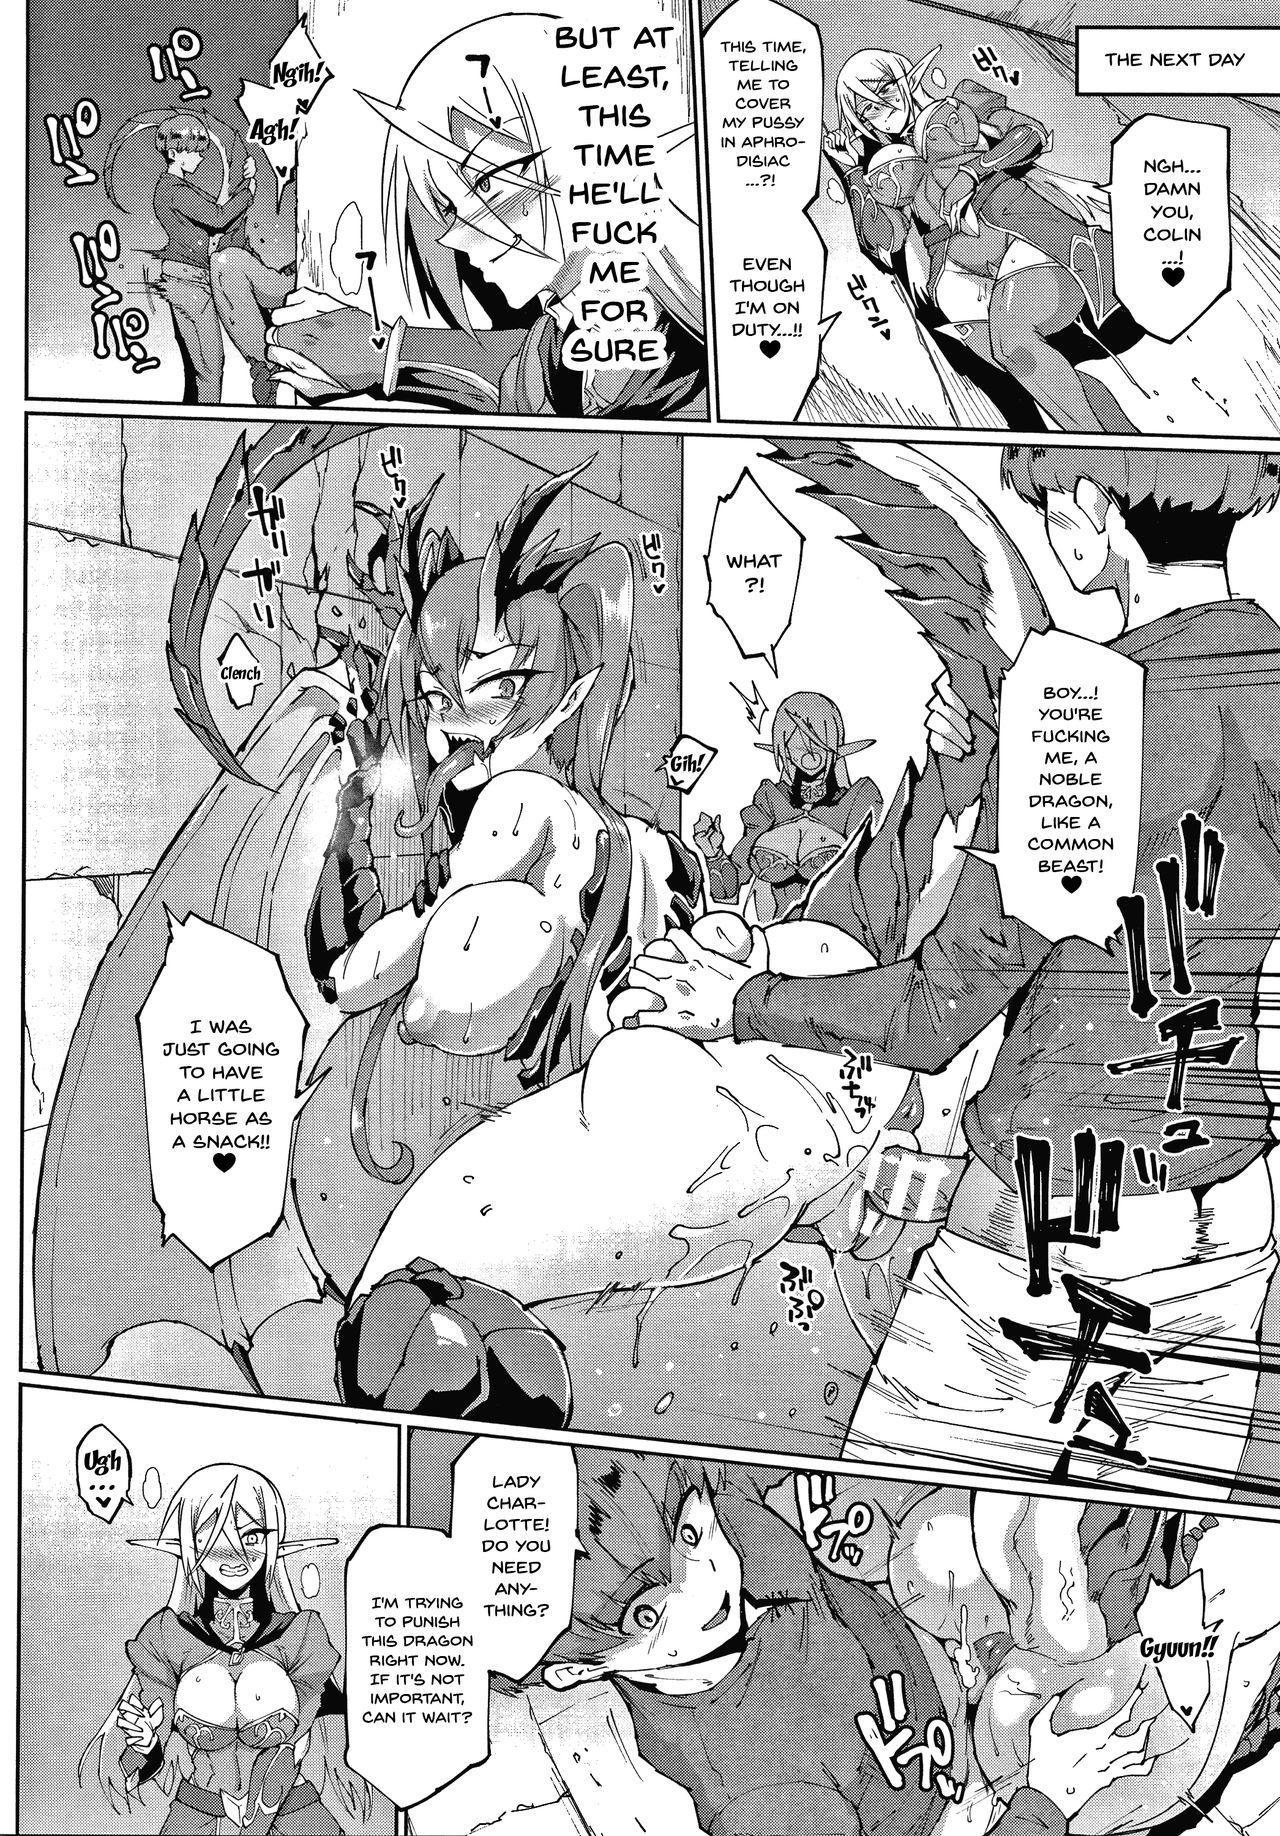 [Fan no Hitori] Sennen Reijou ~My Lady, My Master~  Ch.1-6 [English] {Doujins.com} 98